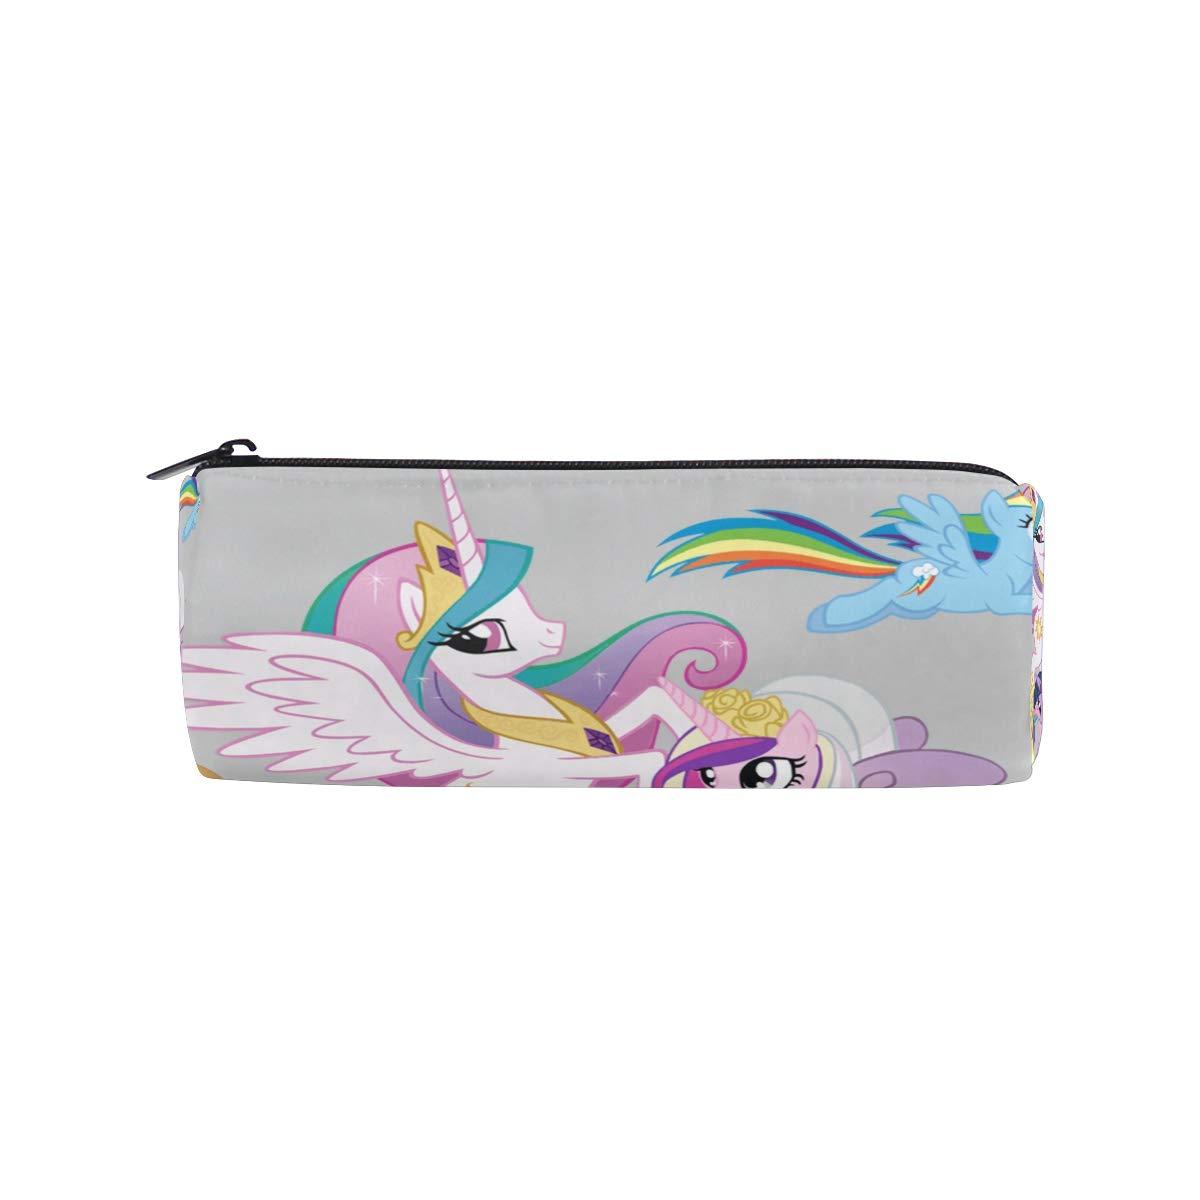 Pencil Pouch My Little Pony Unicorn Family Zipit Cute Pencil Cases School Pen Organizer Holder Womens Makeup Bag